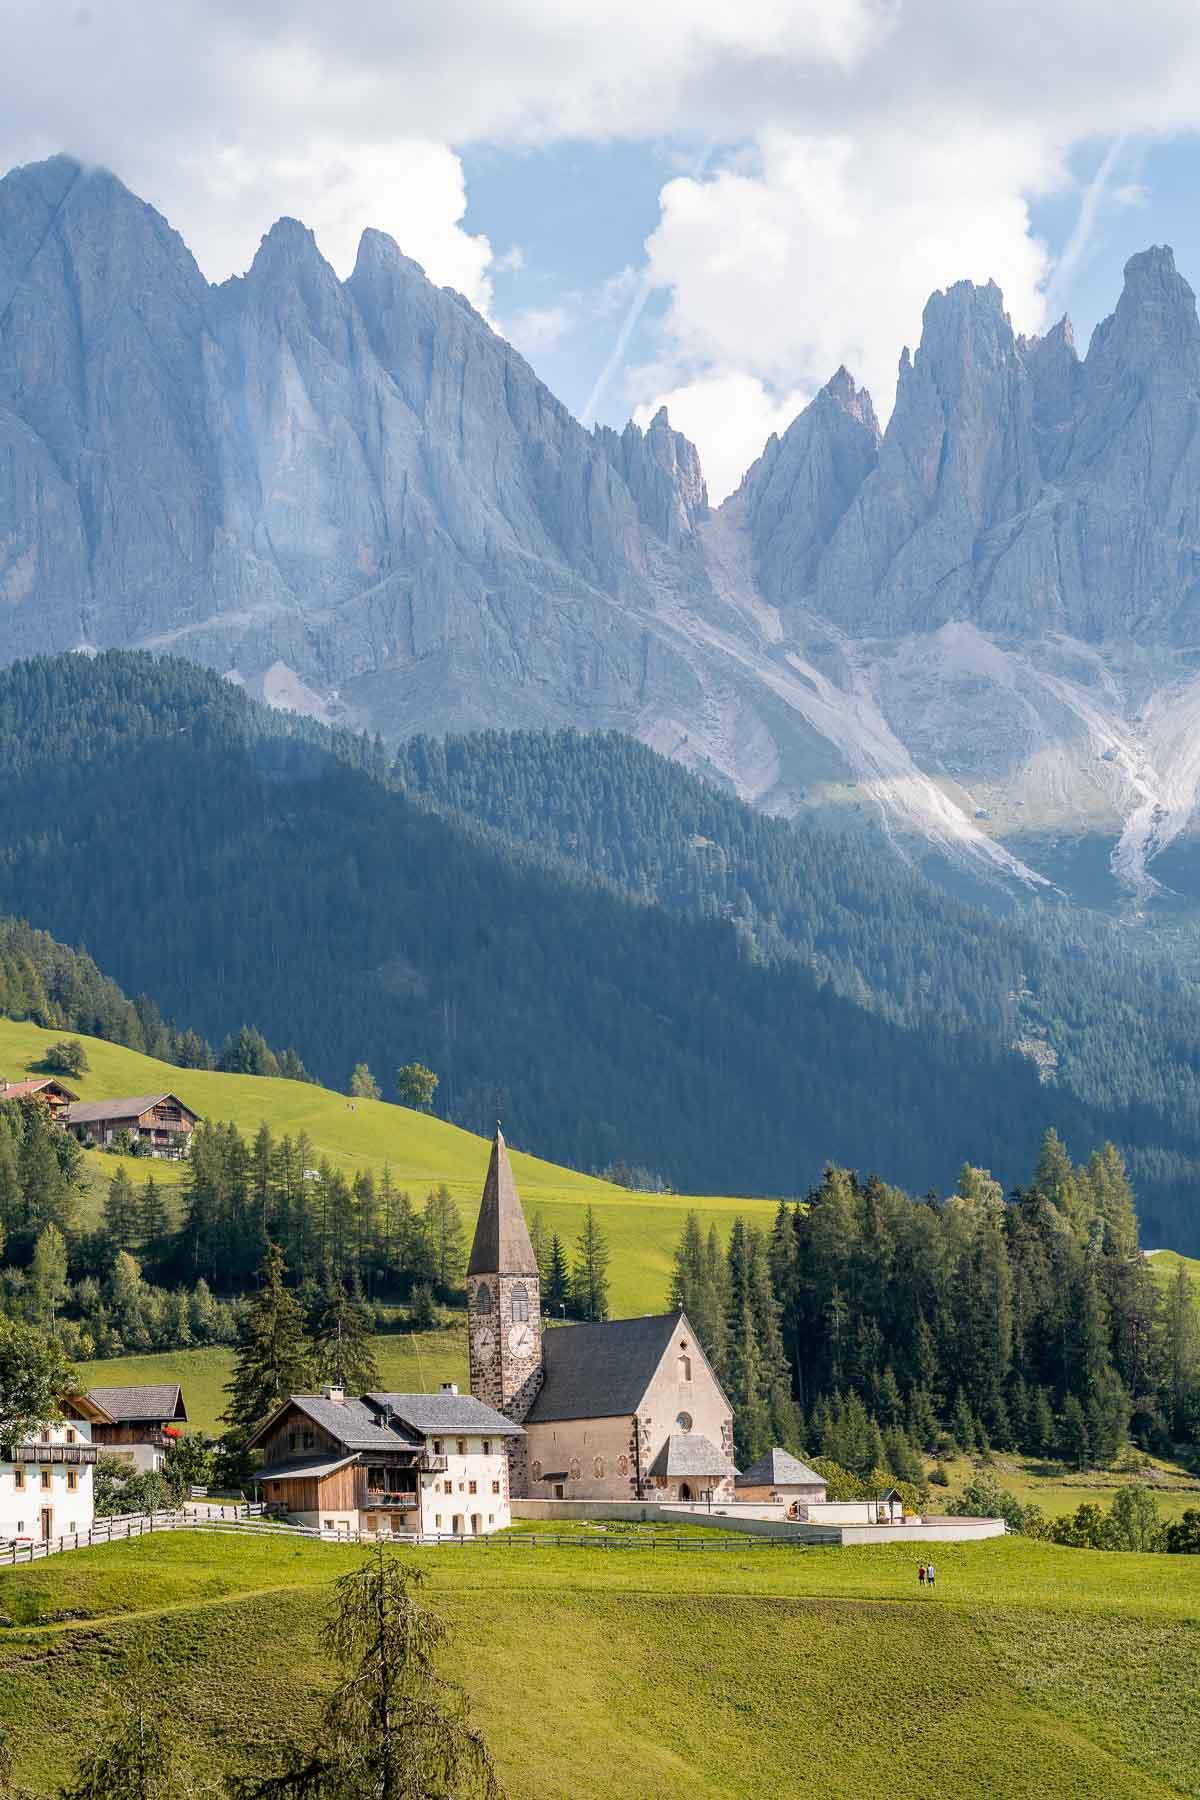 View of Santa Maddalena Church in Val di Funes, Dolomites